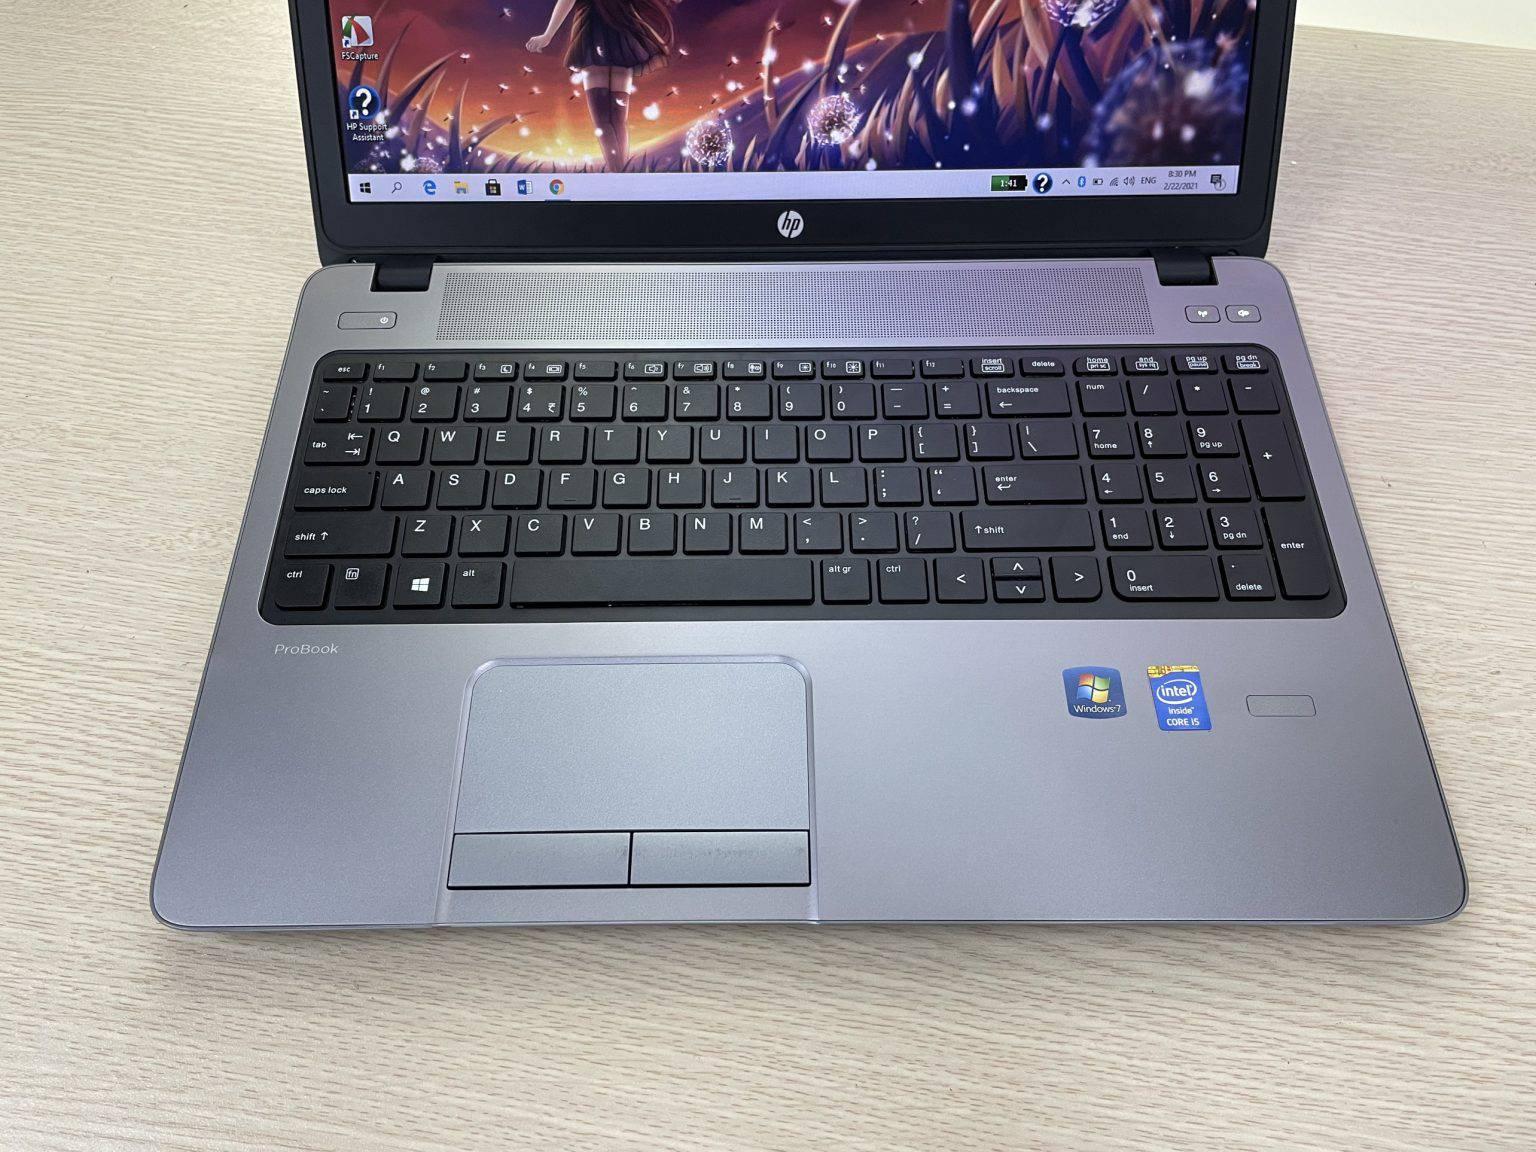 LAPTOP HP PROBOOK 450 G1 I5